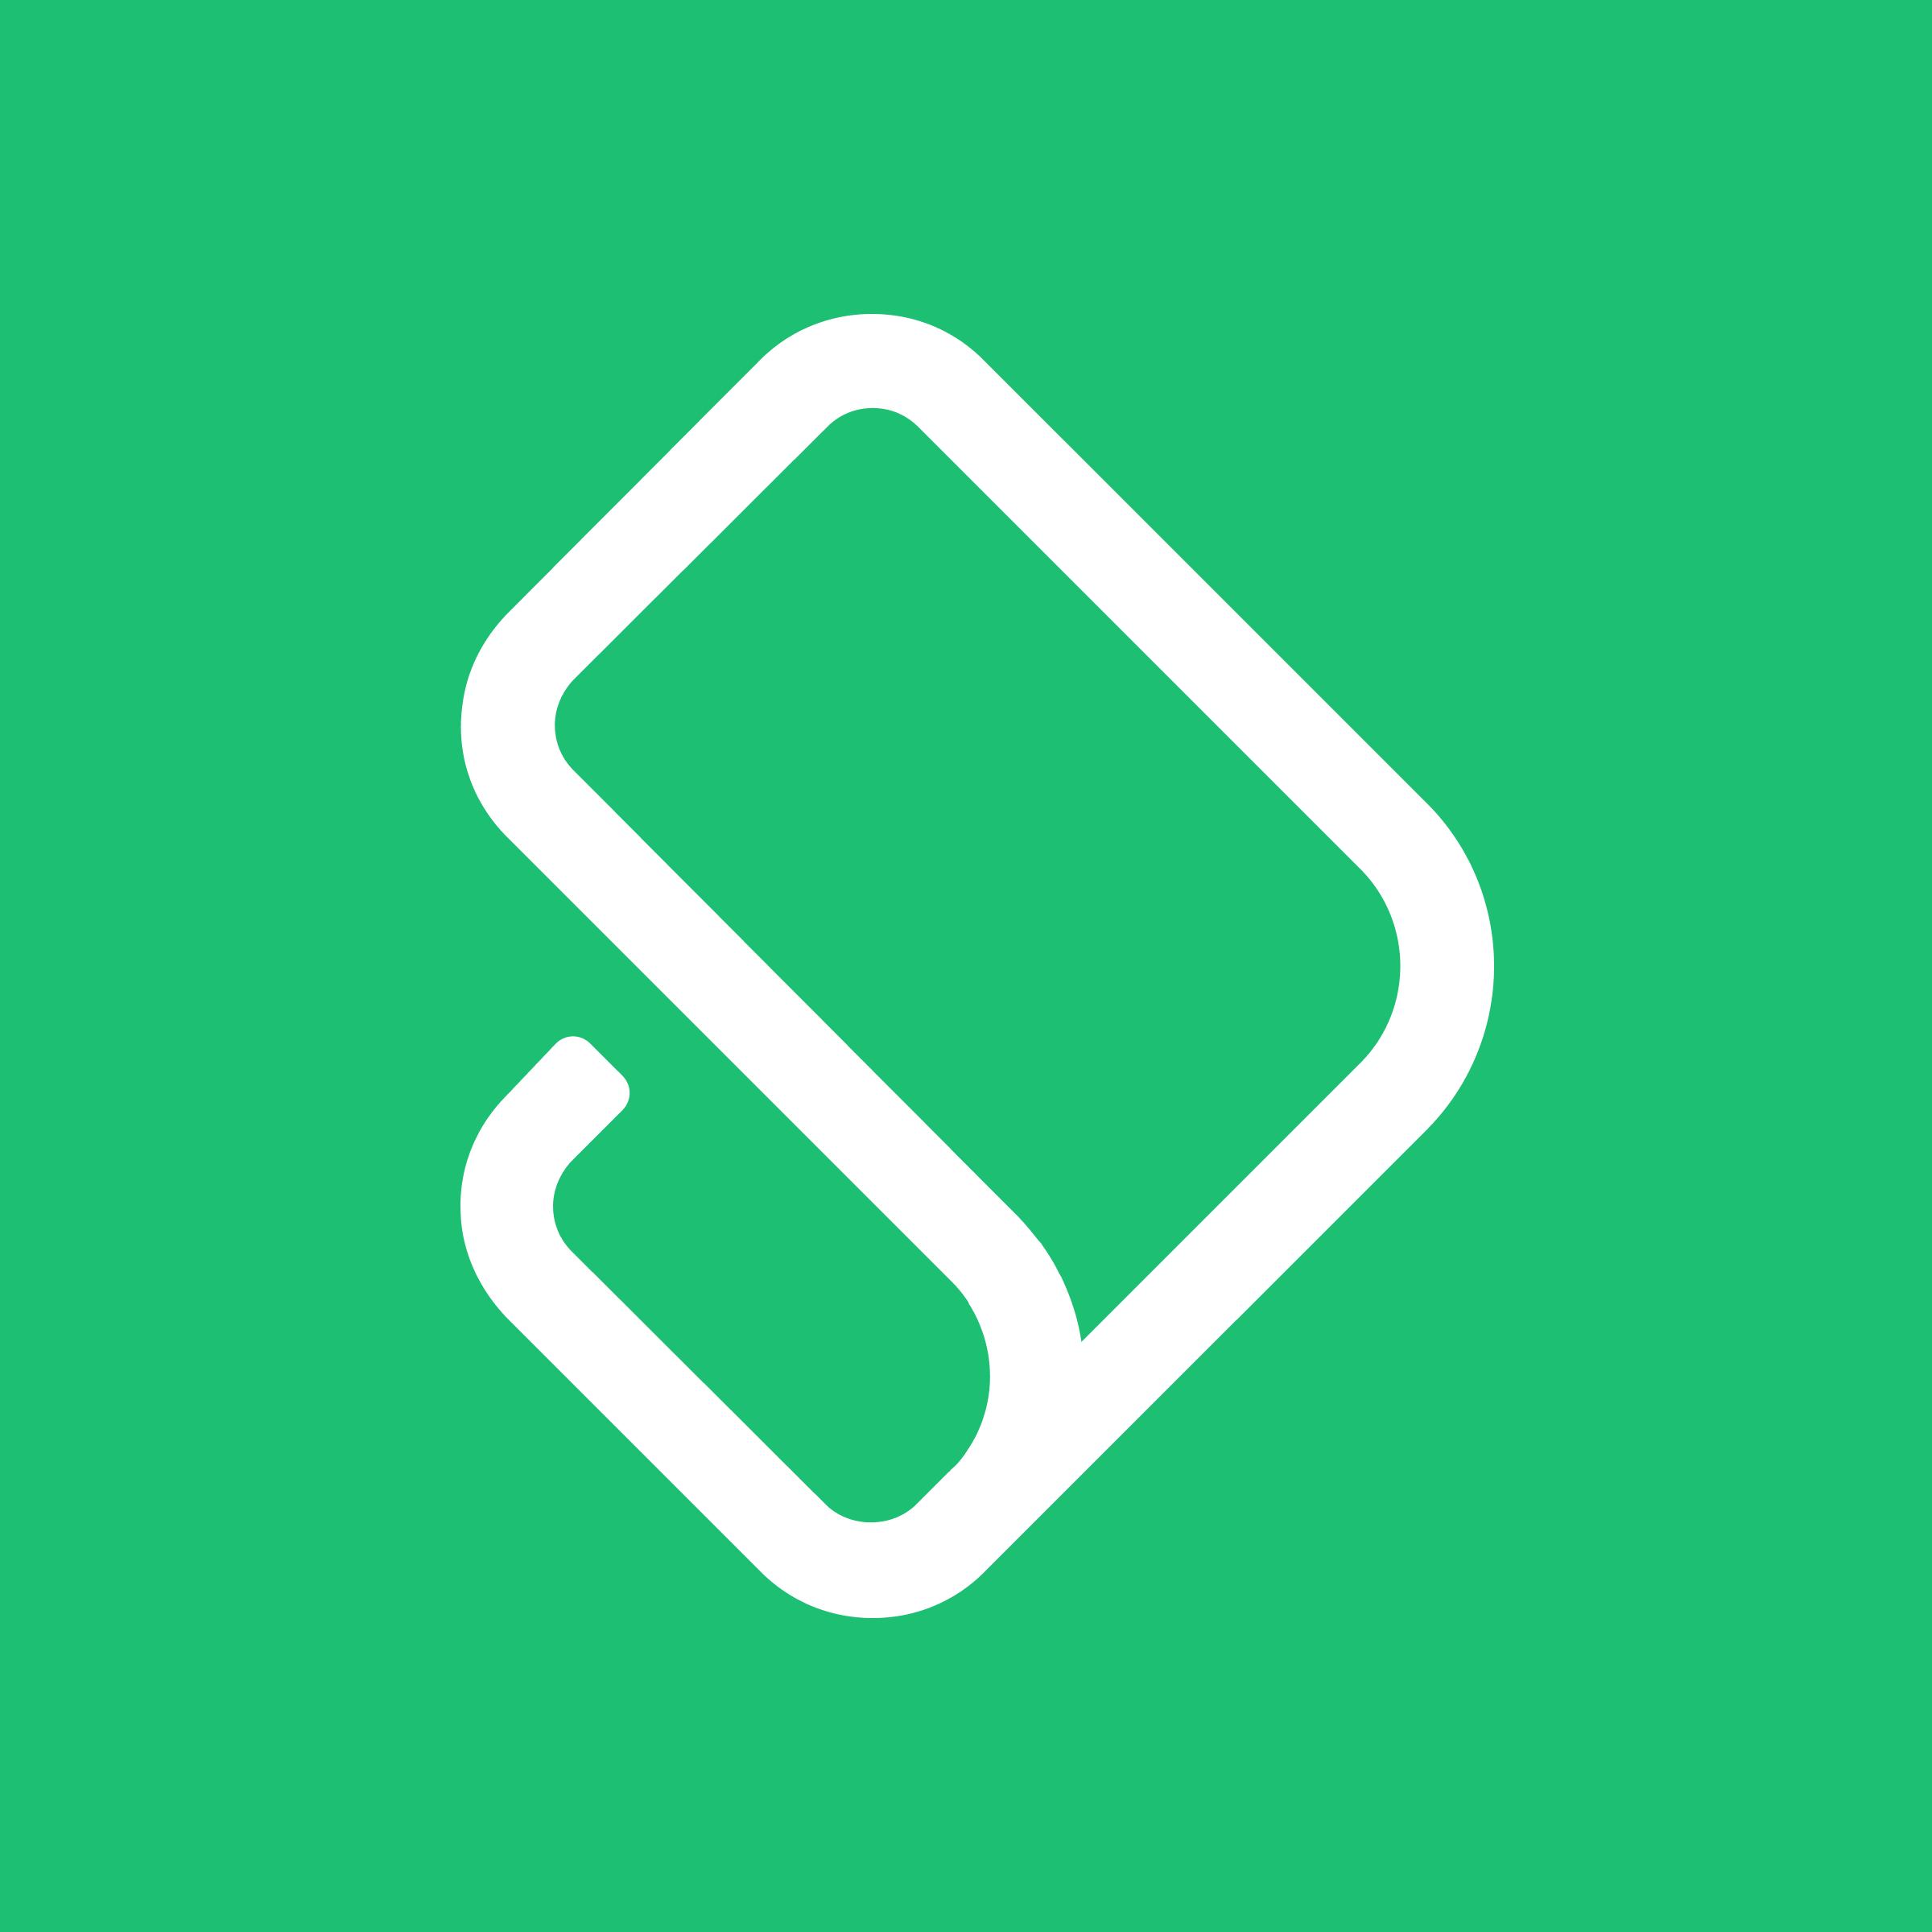 Push Operations logo